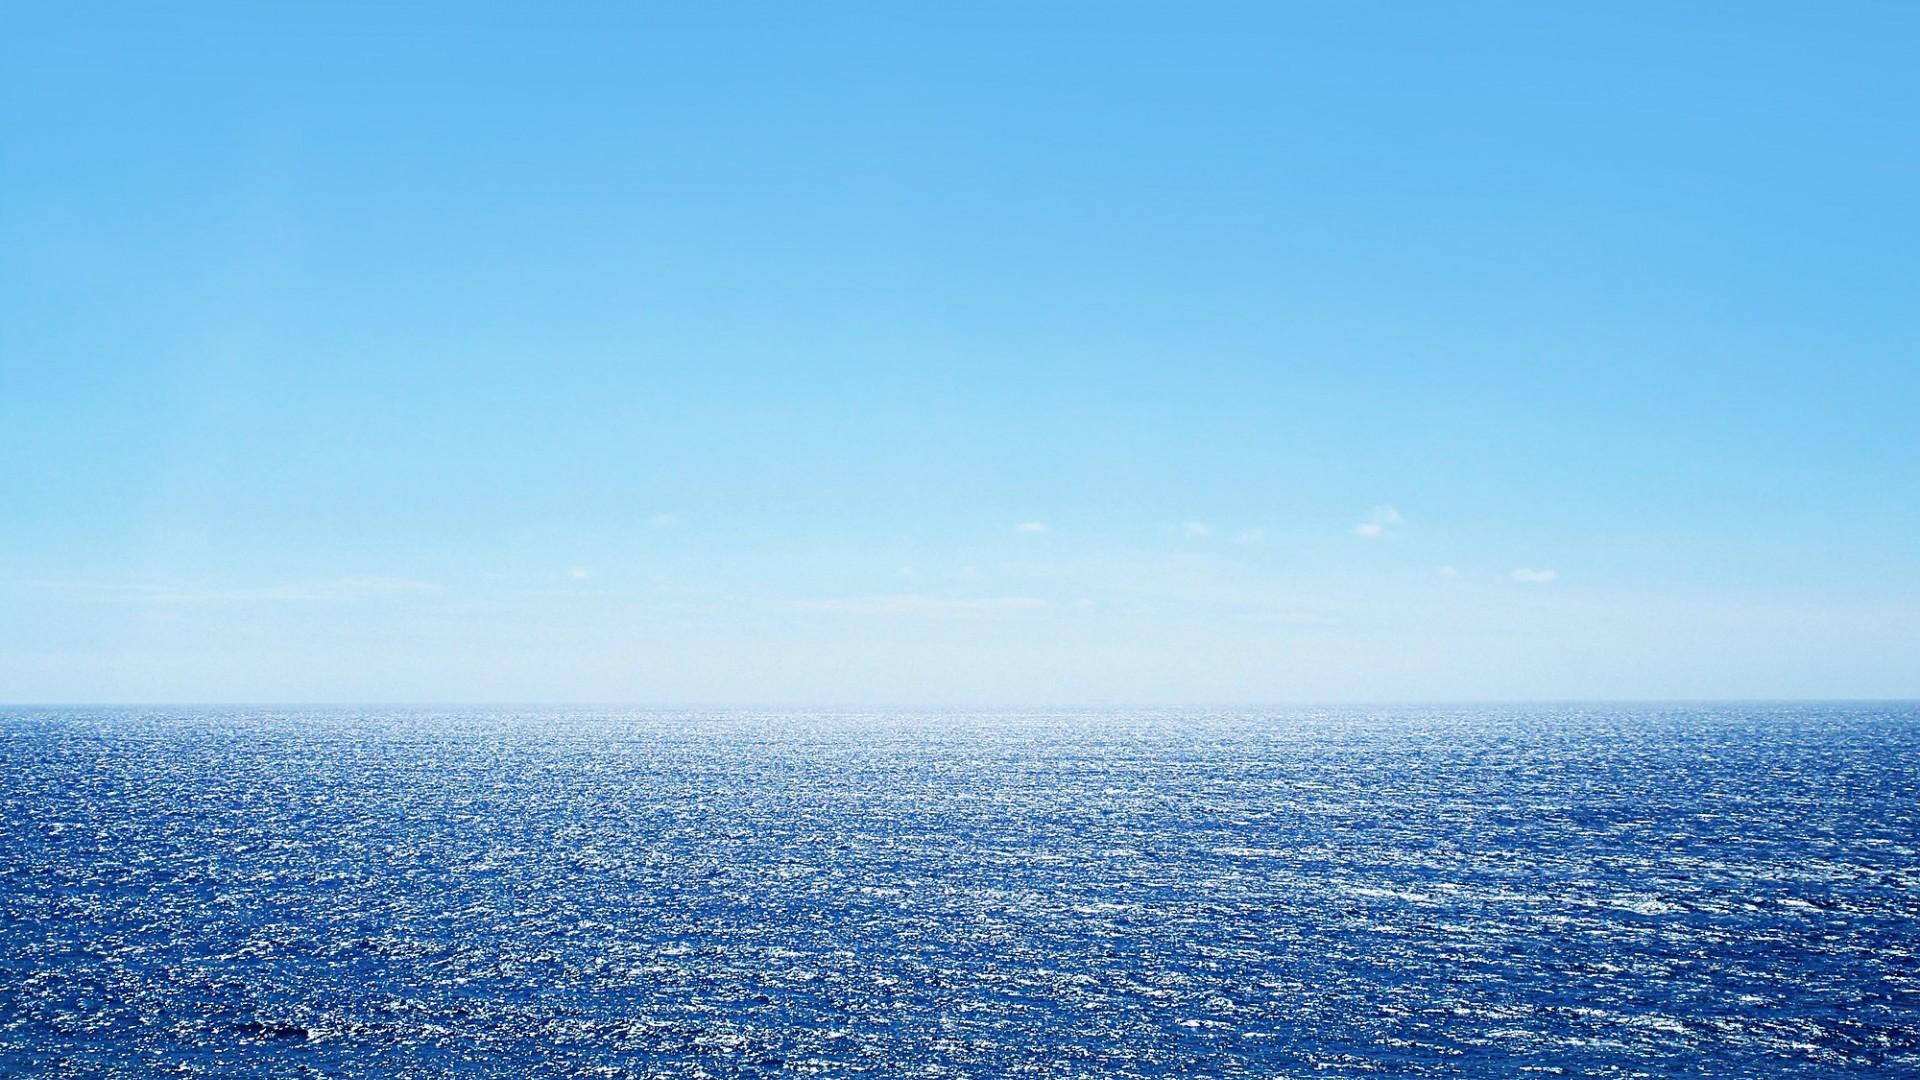 картинки на рабочий стол небо море подхватил